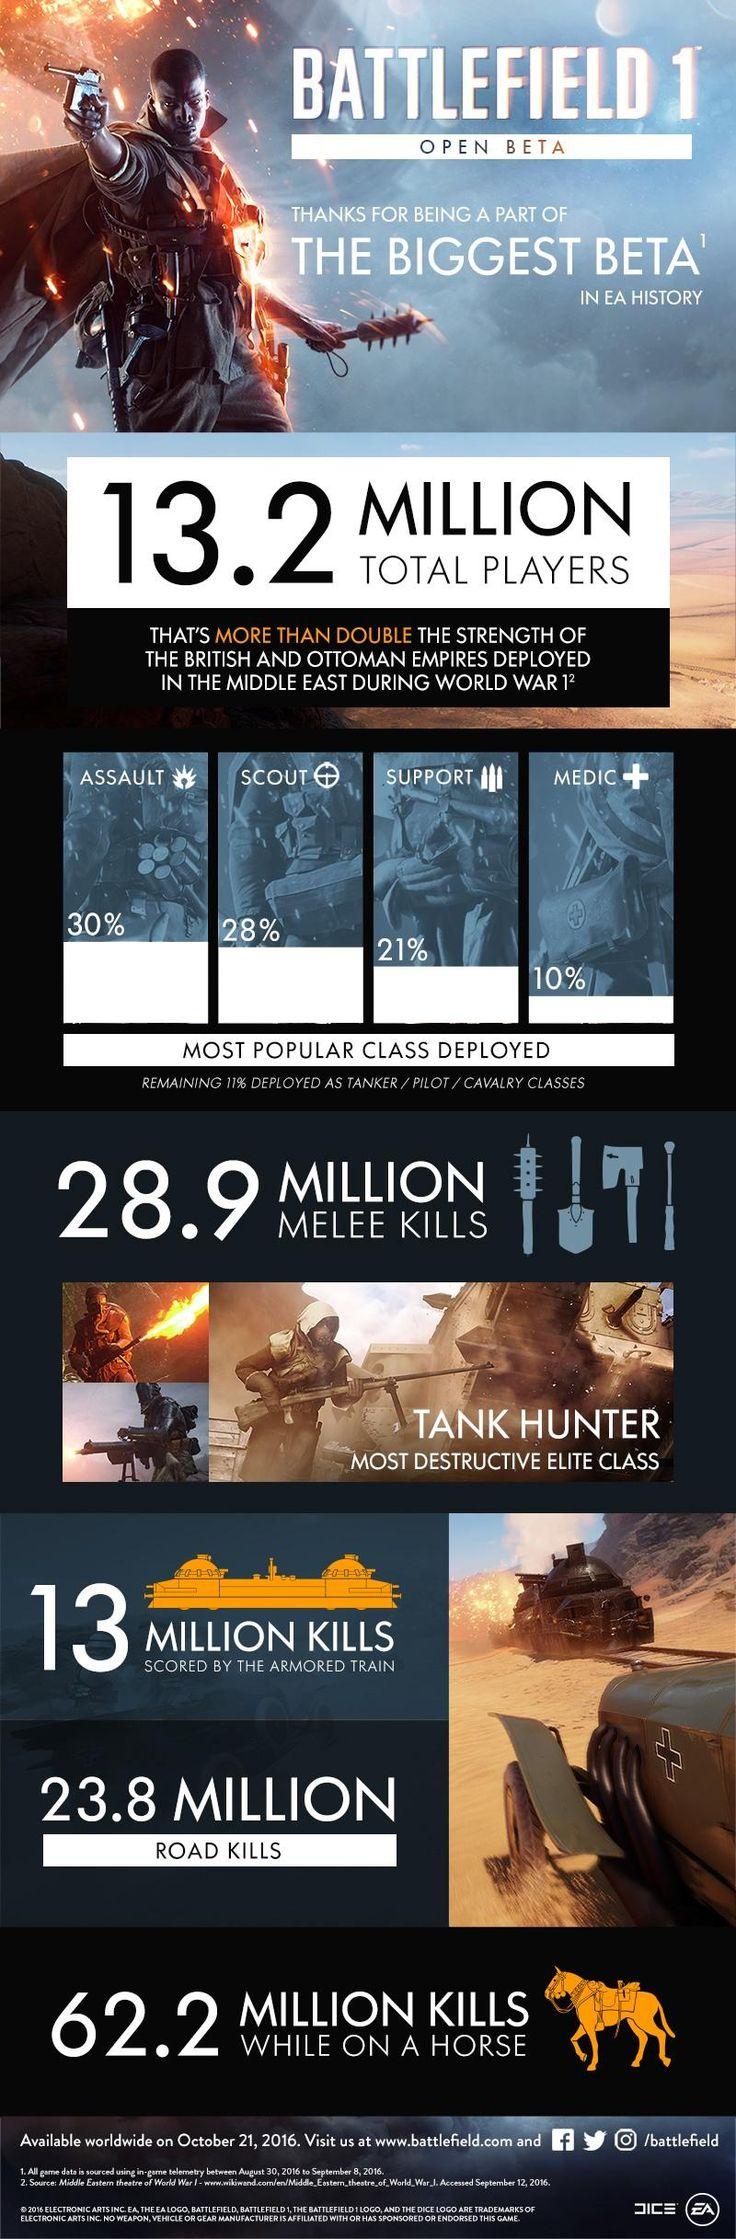 Battlefield 1 Beta Had 13.2 Million Players